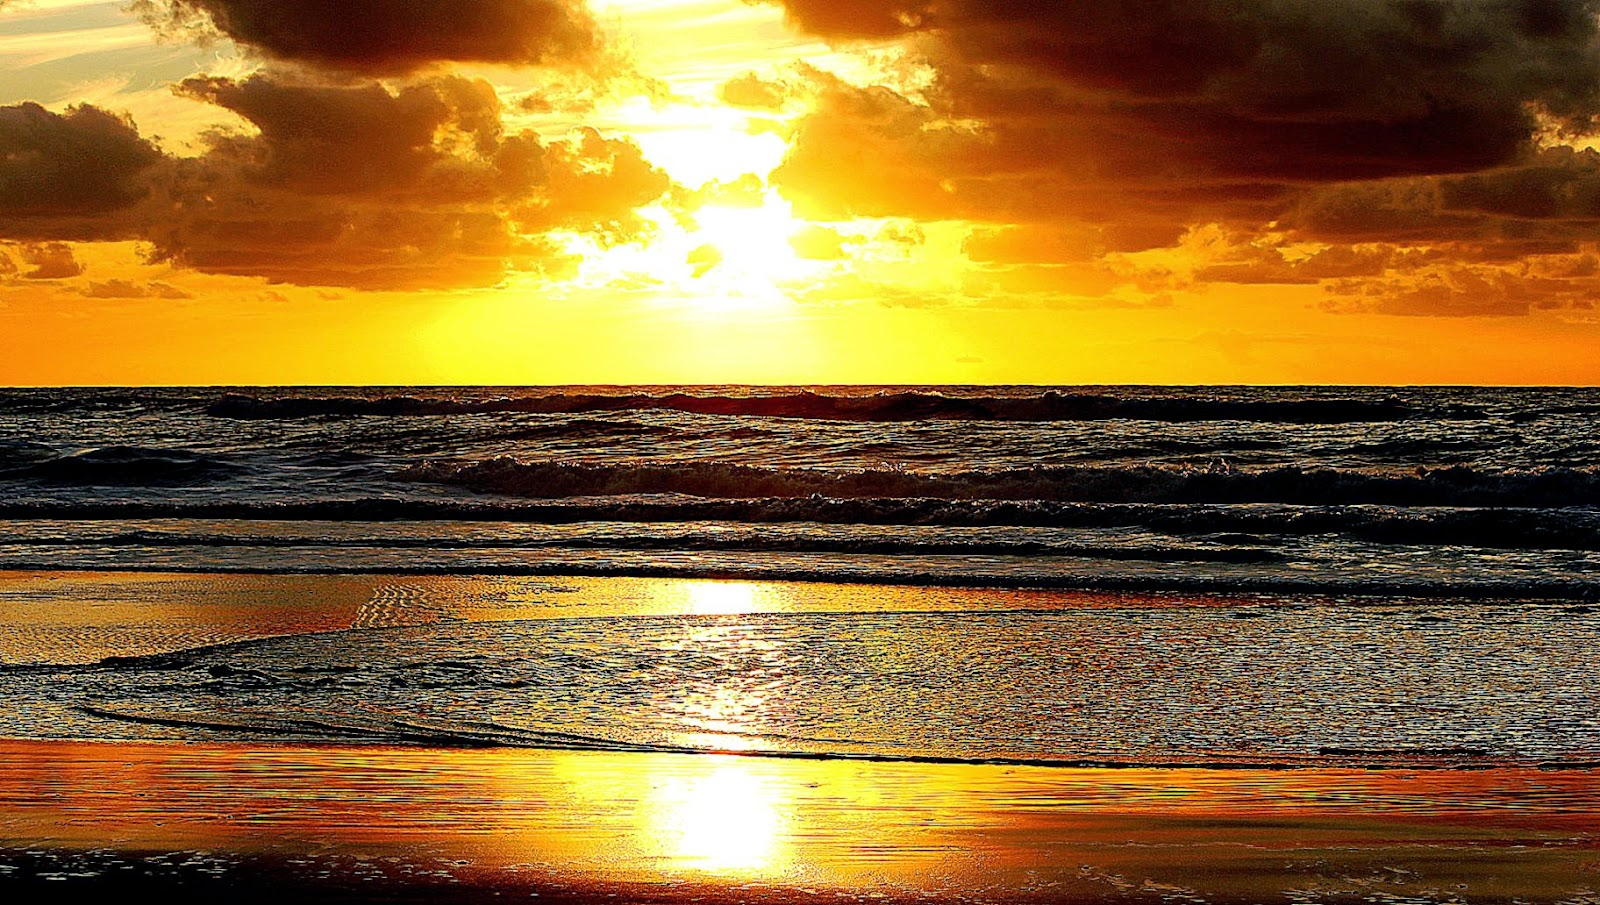 pin golden sunset hd - photo #1